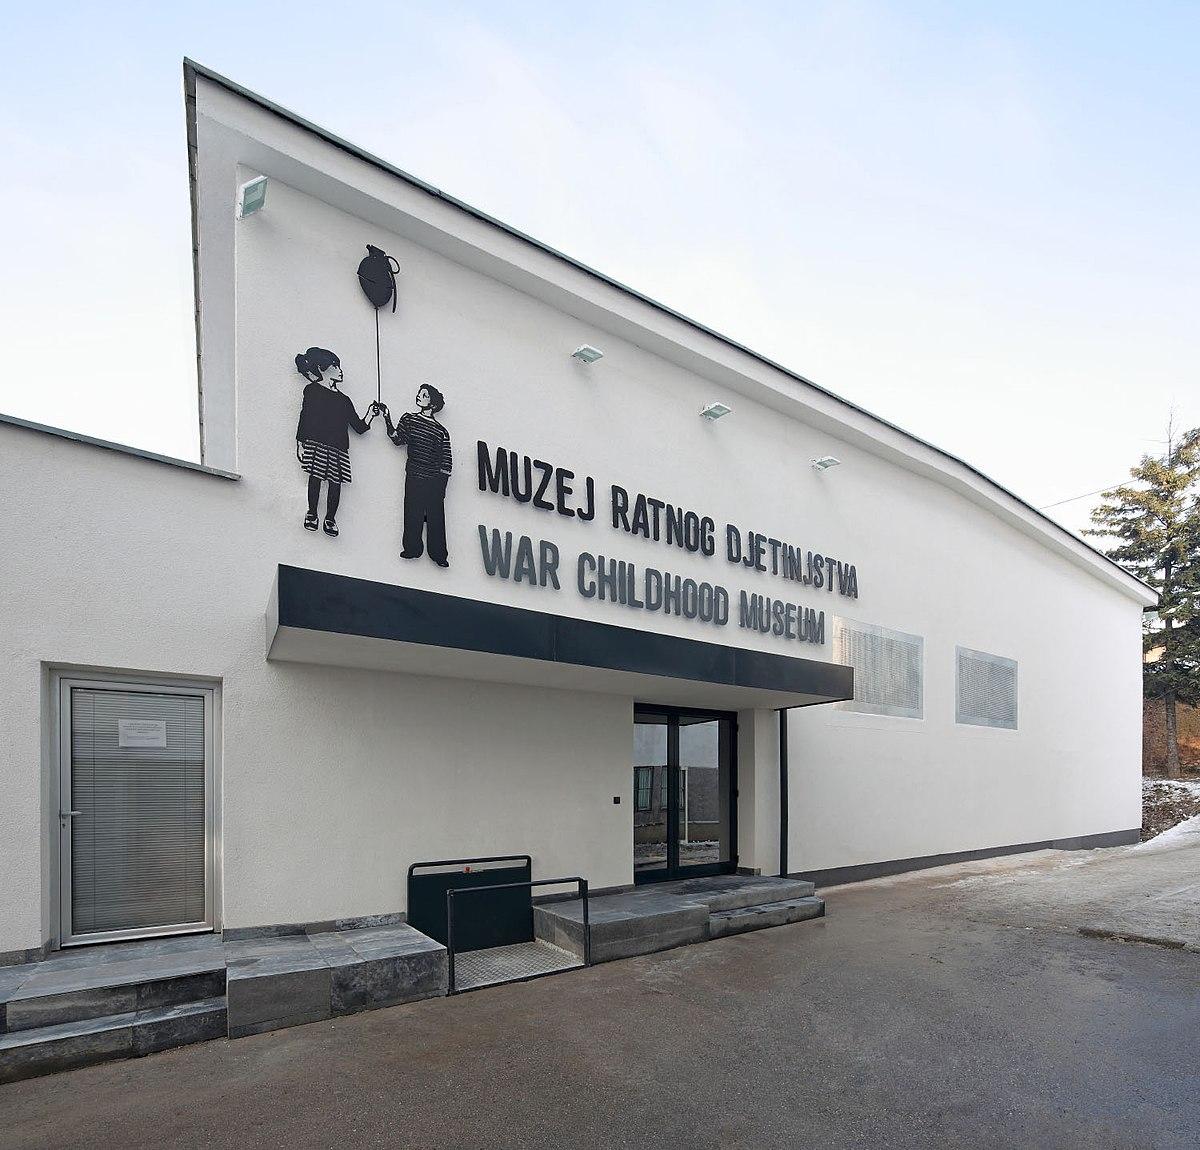 War Childhood Museum - Wikipedia